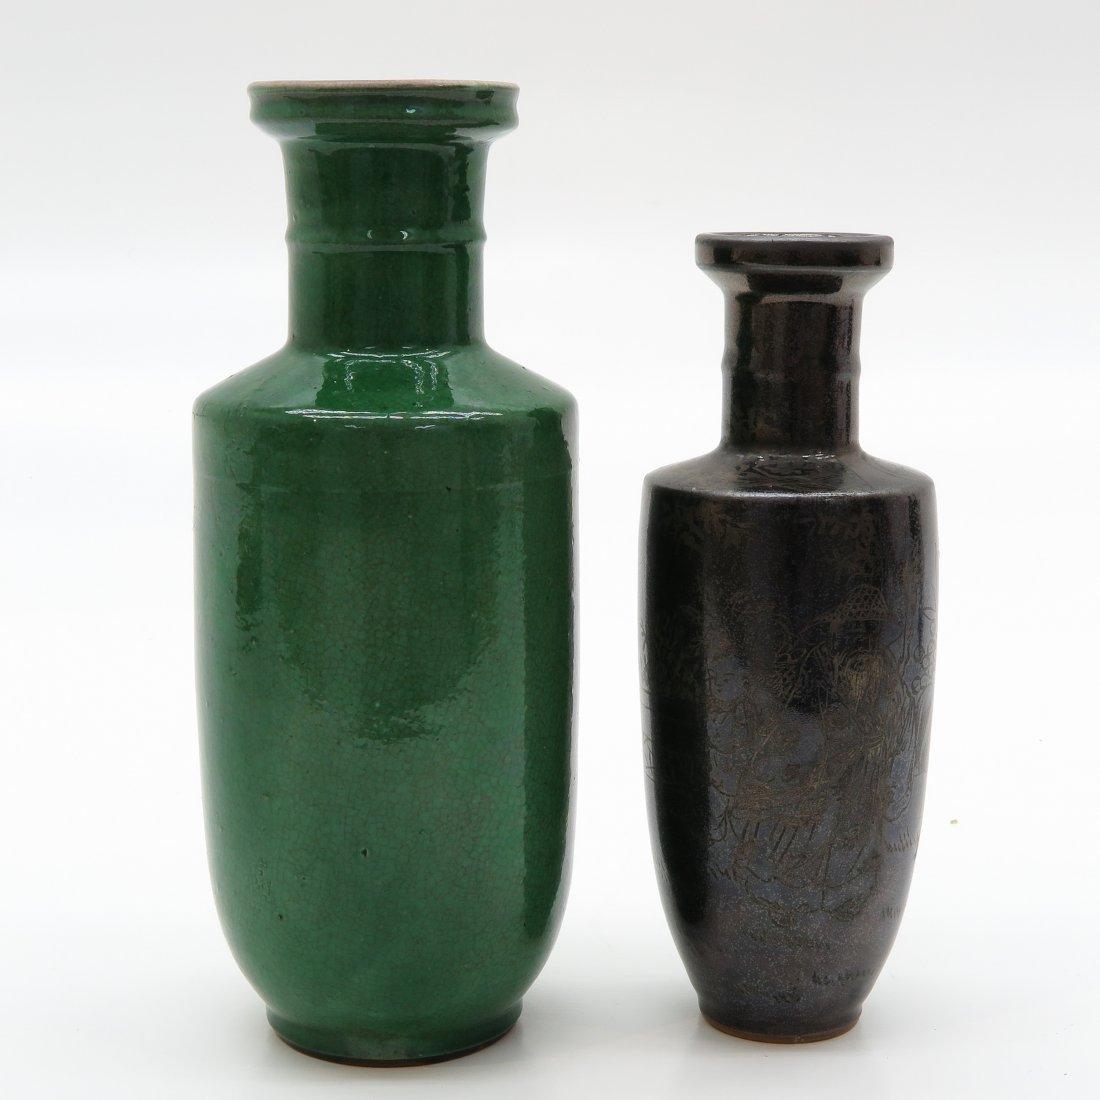 Lot of 2 China Porcelain Vases - 4